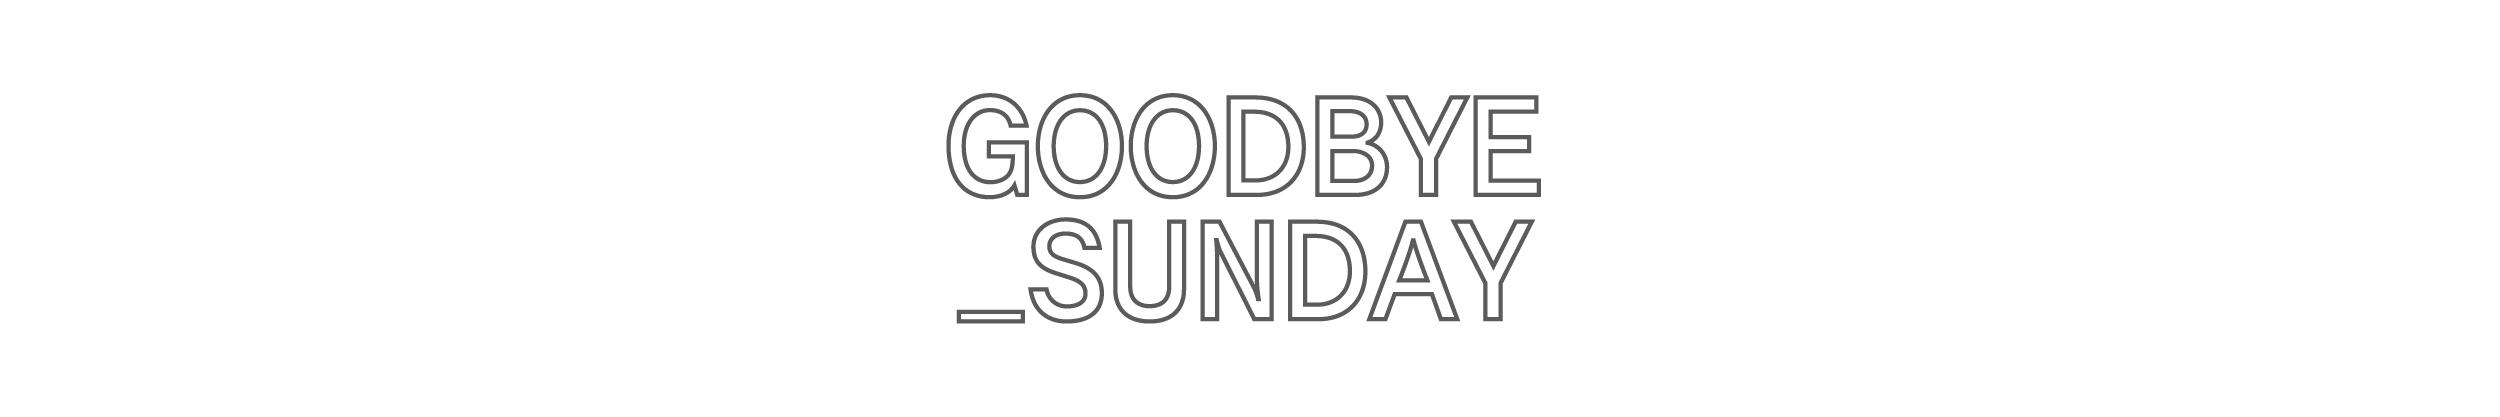 Goodbye Sunday